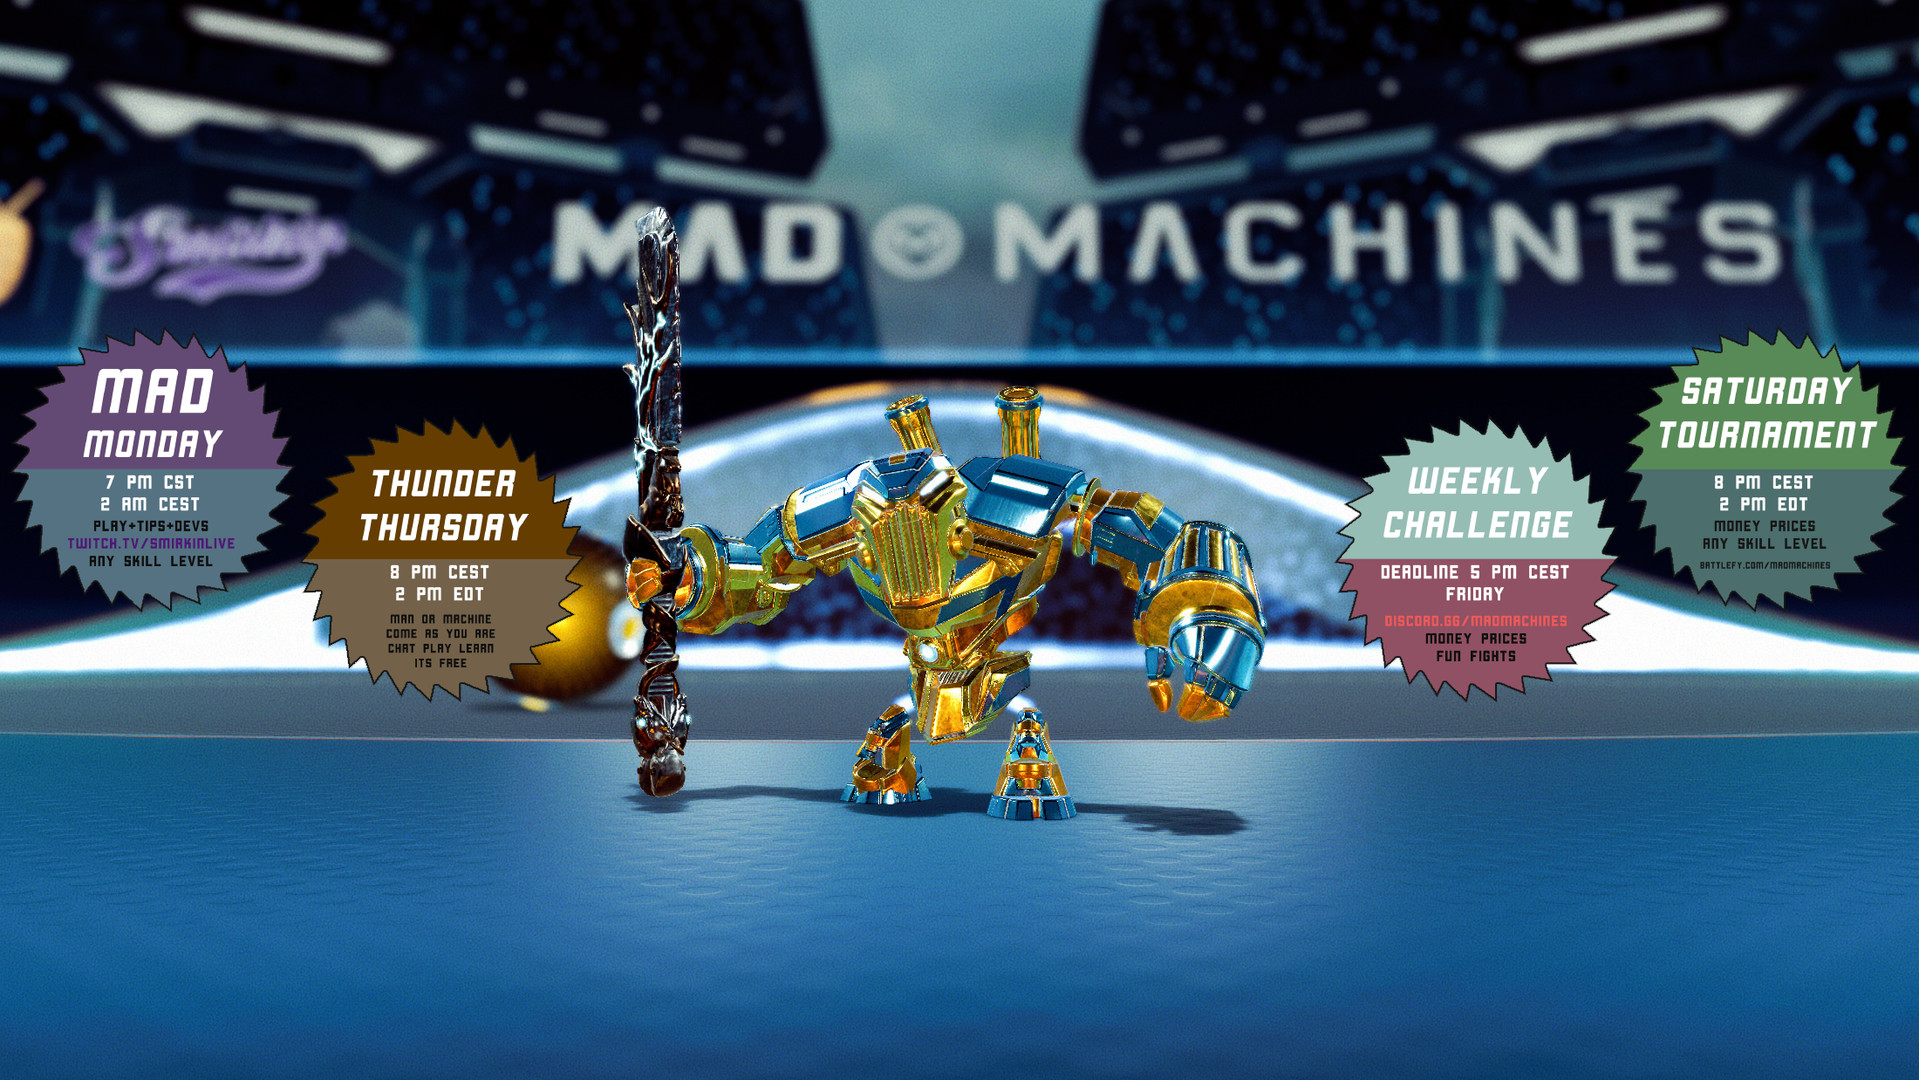 Mad monday game 2 napoleon casino bradford